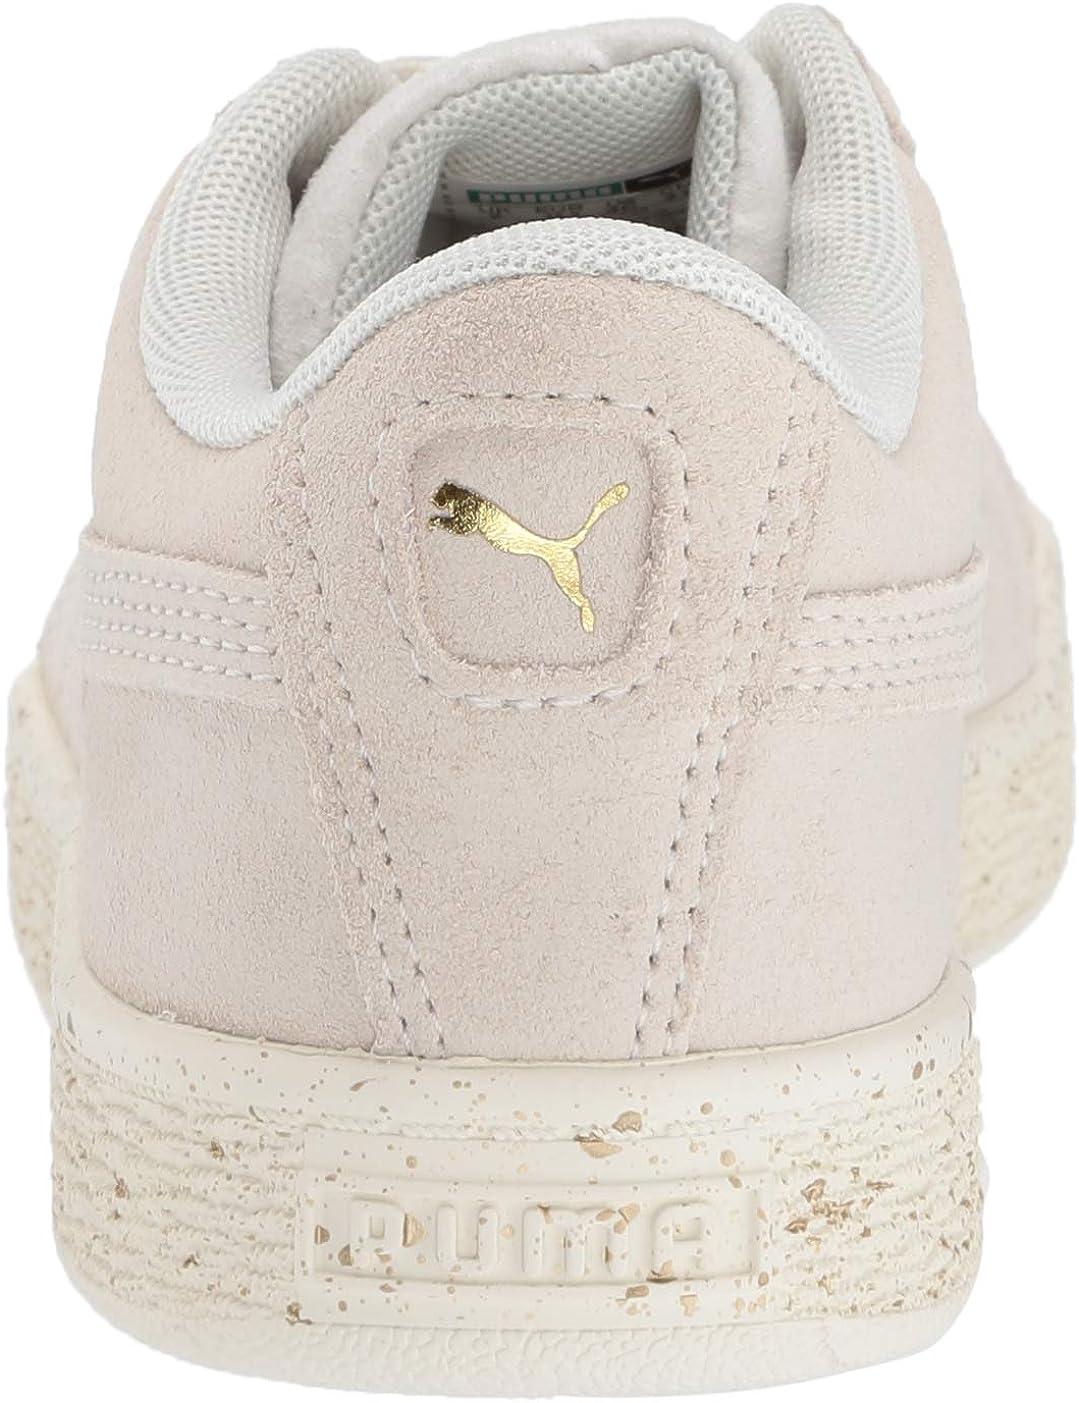 PUMA Suede Classic Tonal Speckle Kids Sneaker